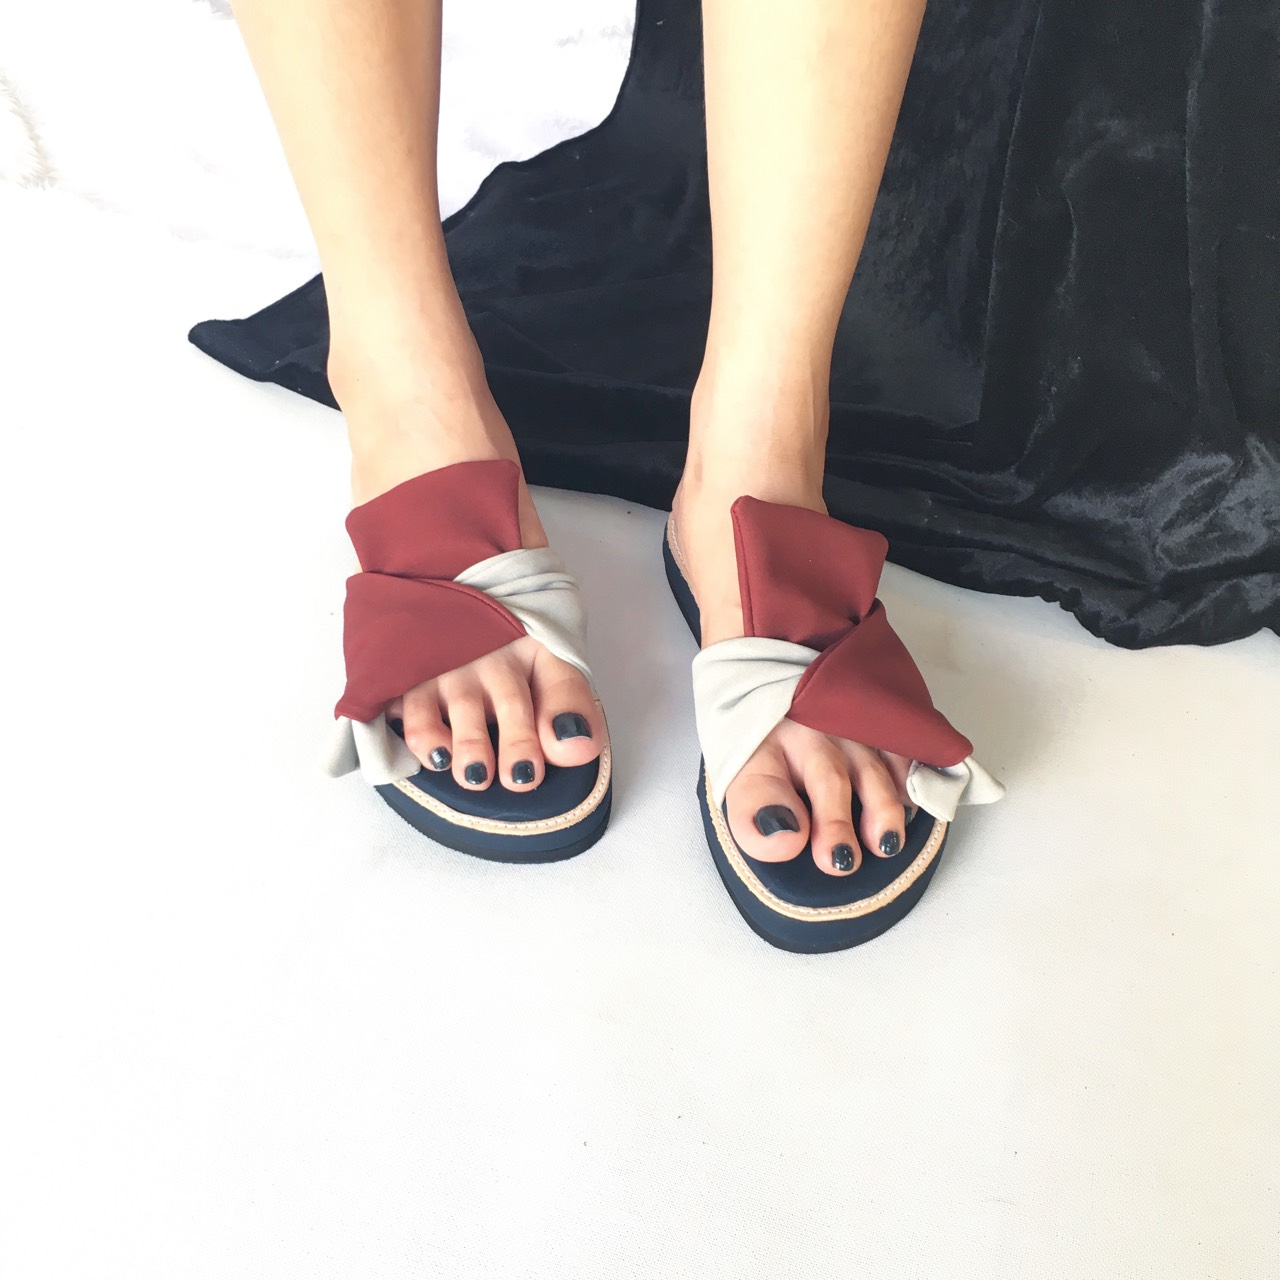 CoolSandals,coolgirl,Whiteoakshoes,women,ผู้หญิง,รองเท้า,รองเท้าผู้หญิง,รองเท้าแตะ